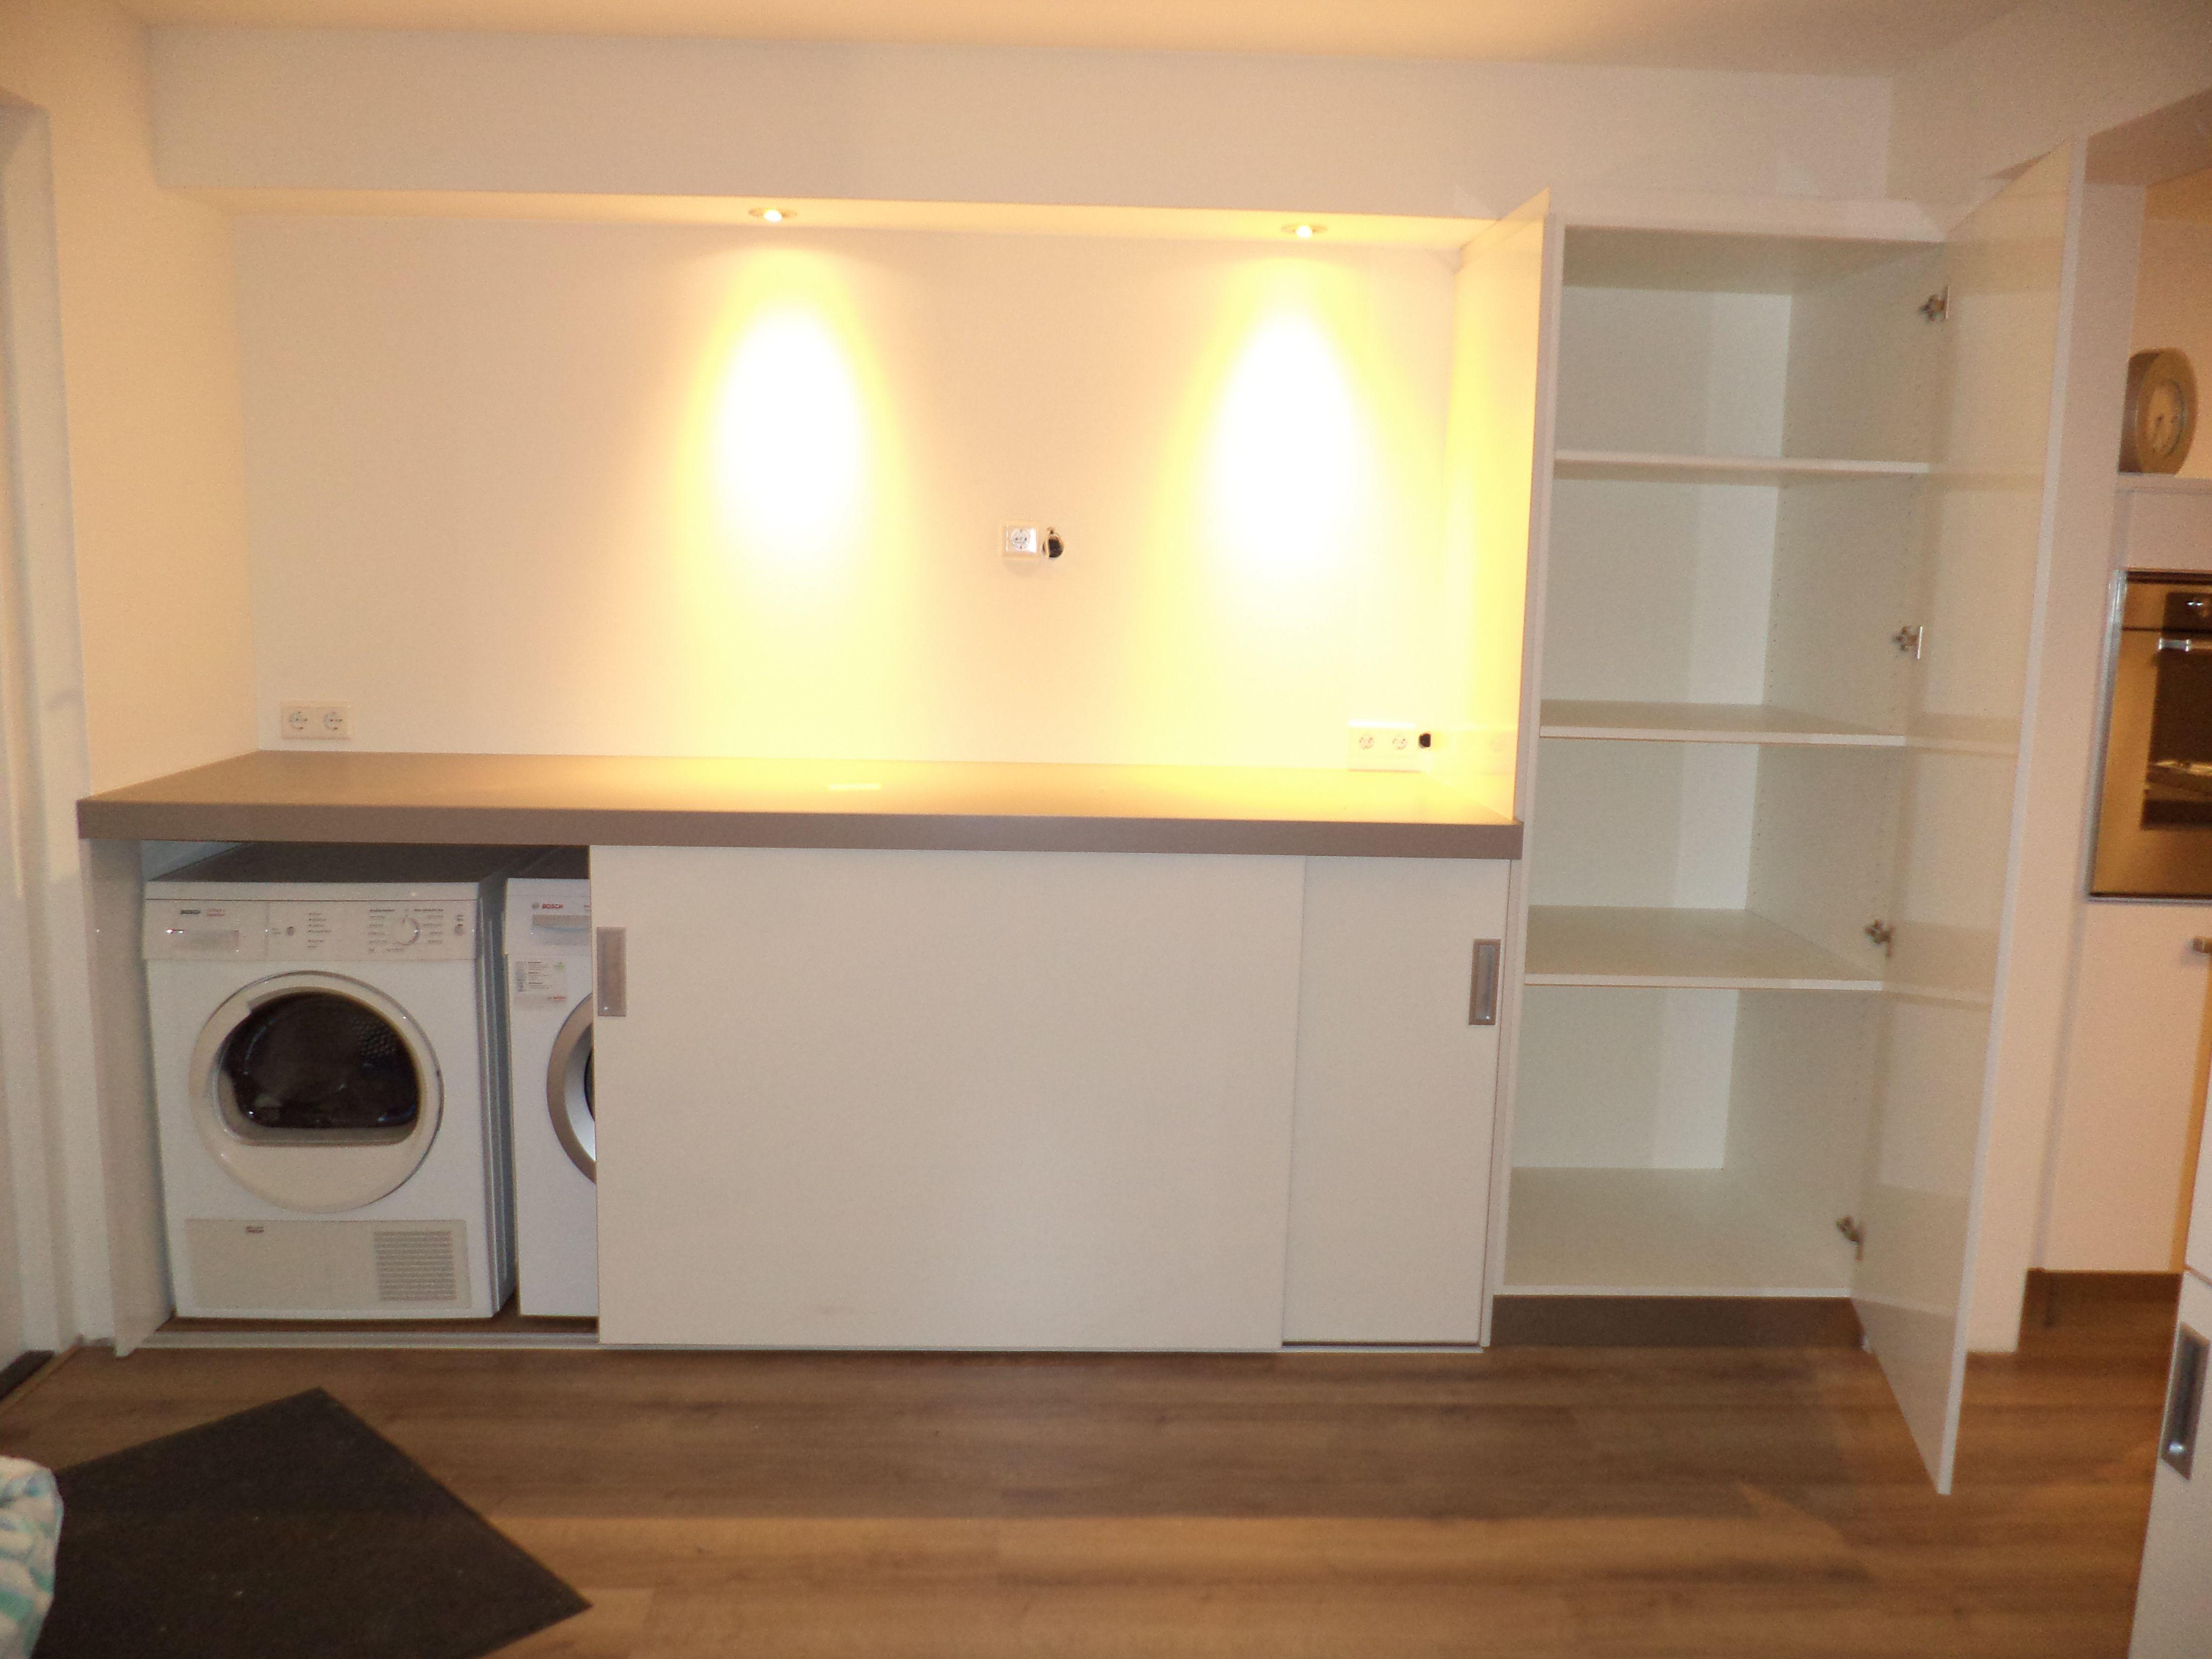 Wasmachine Kast Badkamer : Kast ombouw wasmachine huis kast zolder en badkamer